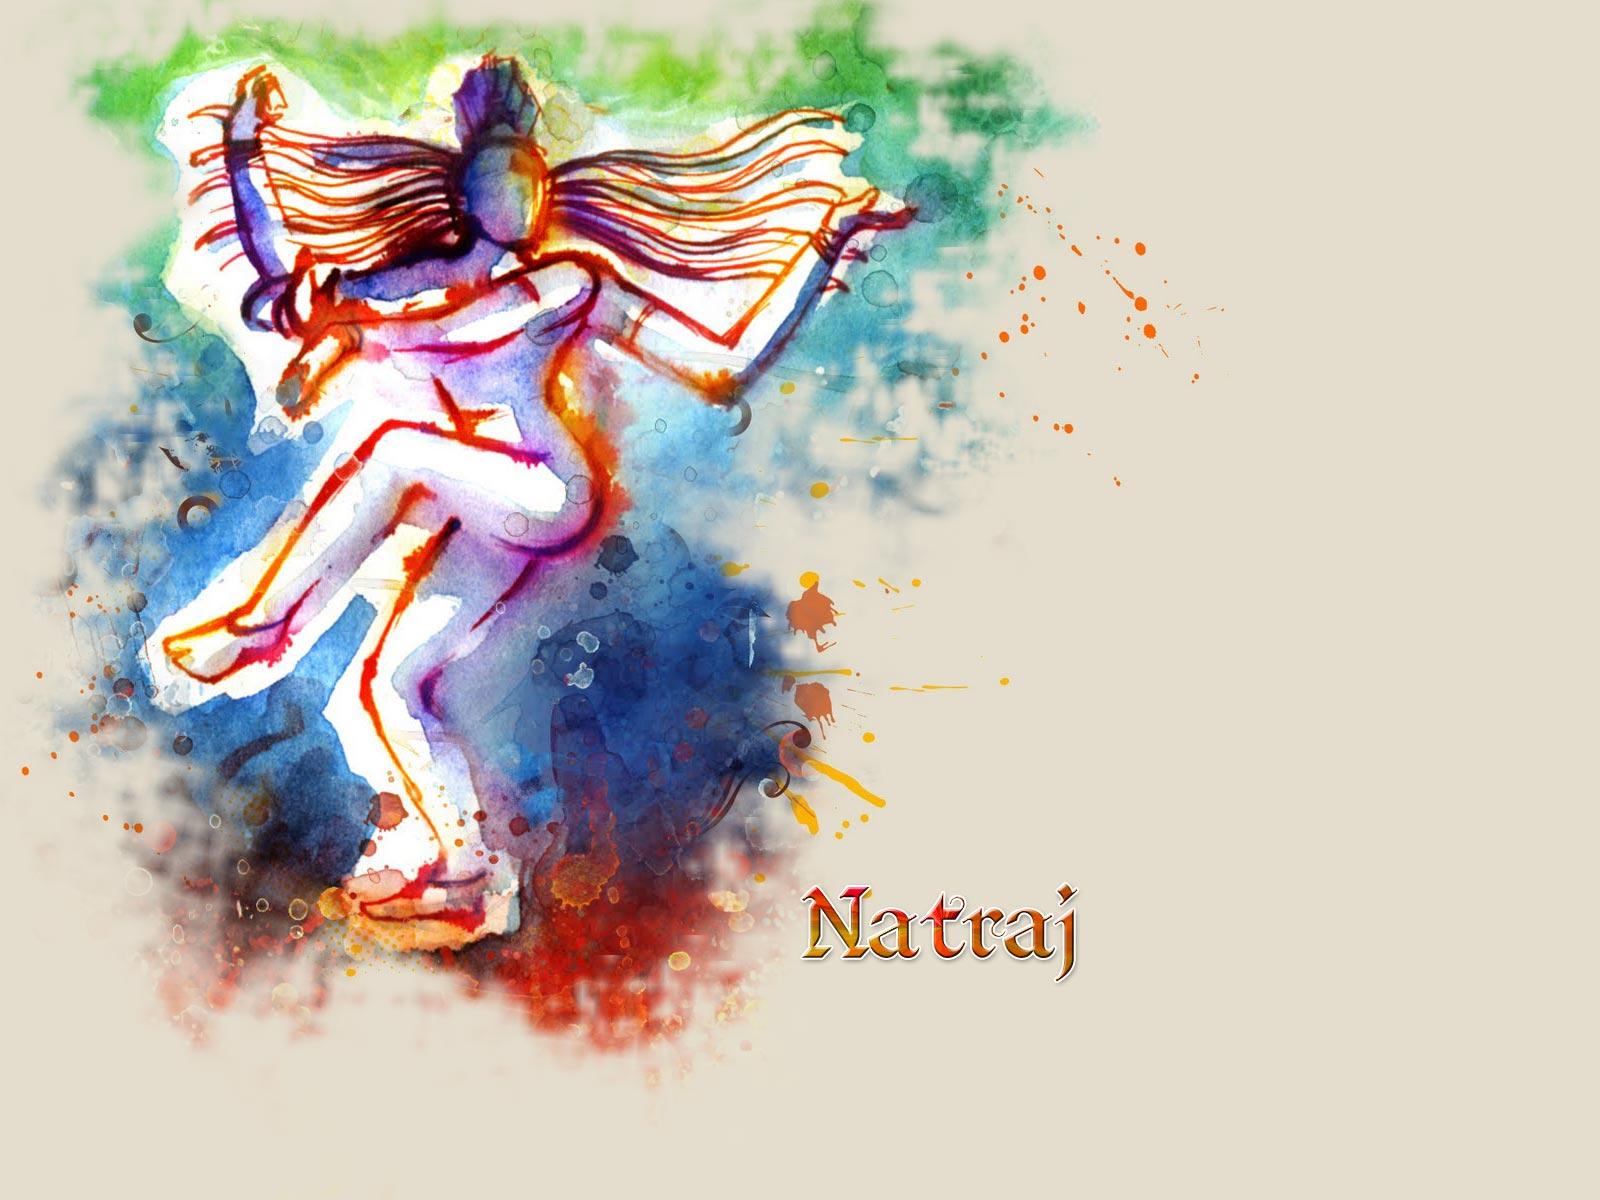 lord nataraja wallpaper hindu god nataraja wallpaper